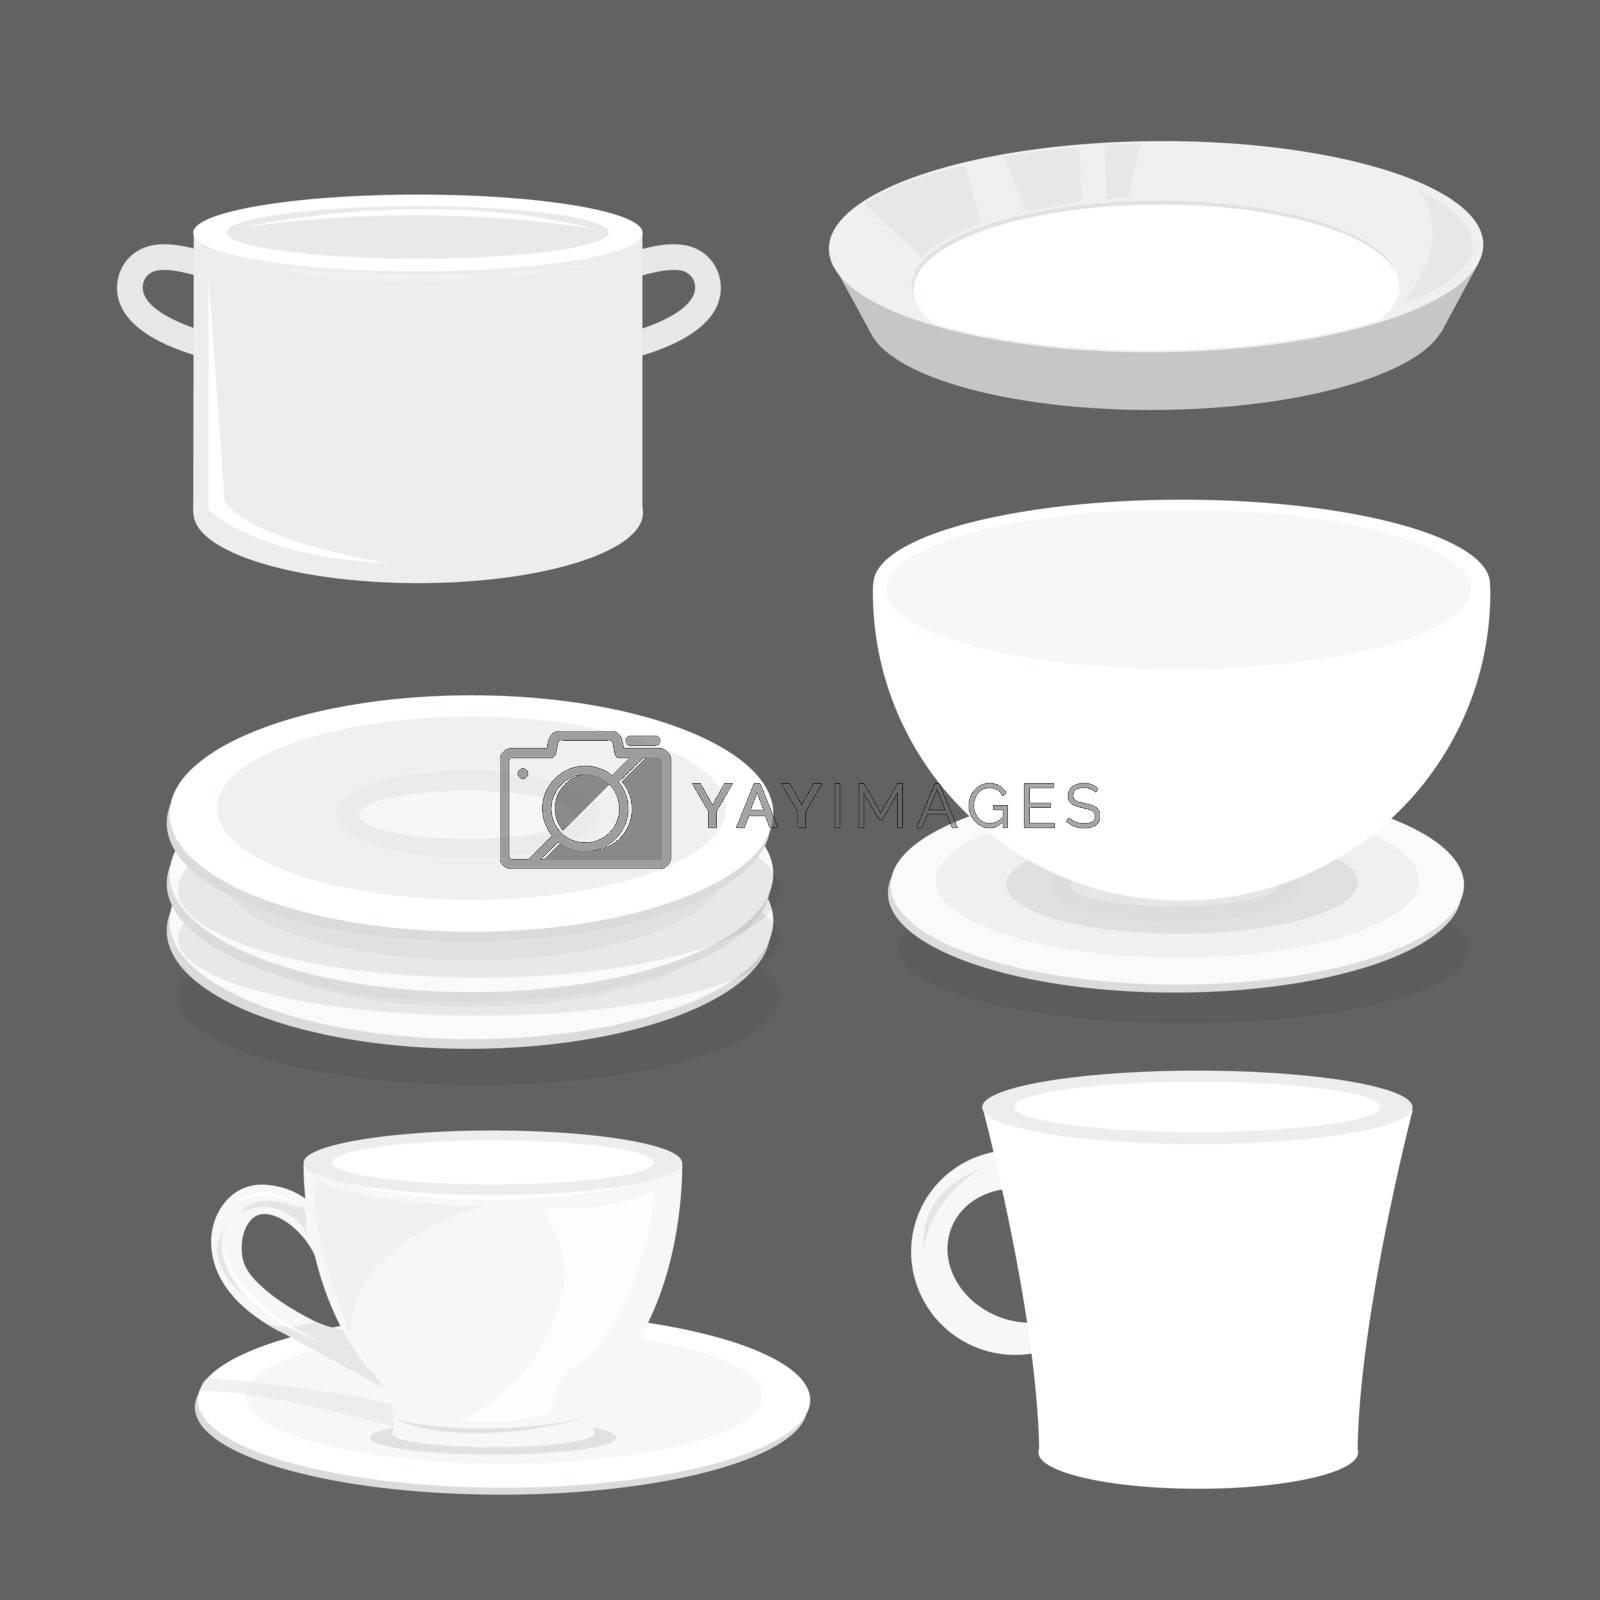 Bowl Dish Plate Cup Tumbler Glass Tray Cartoon Vector